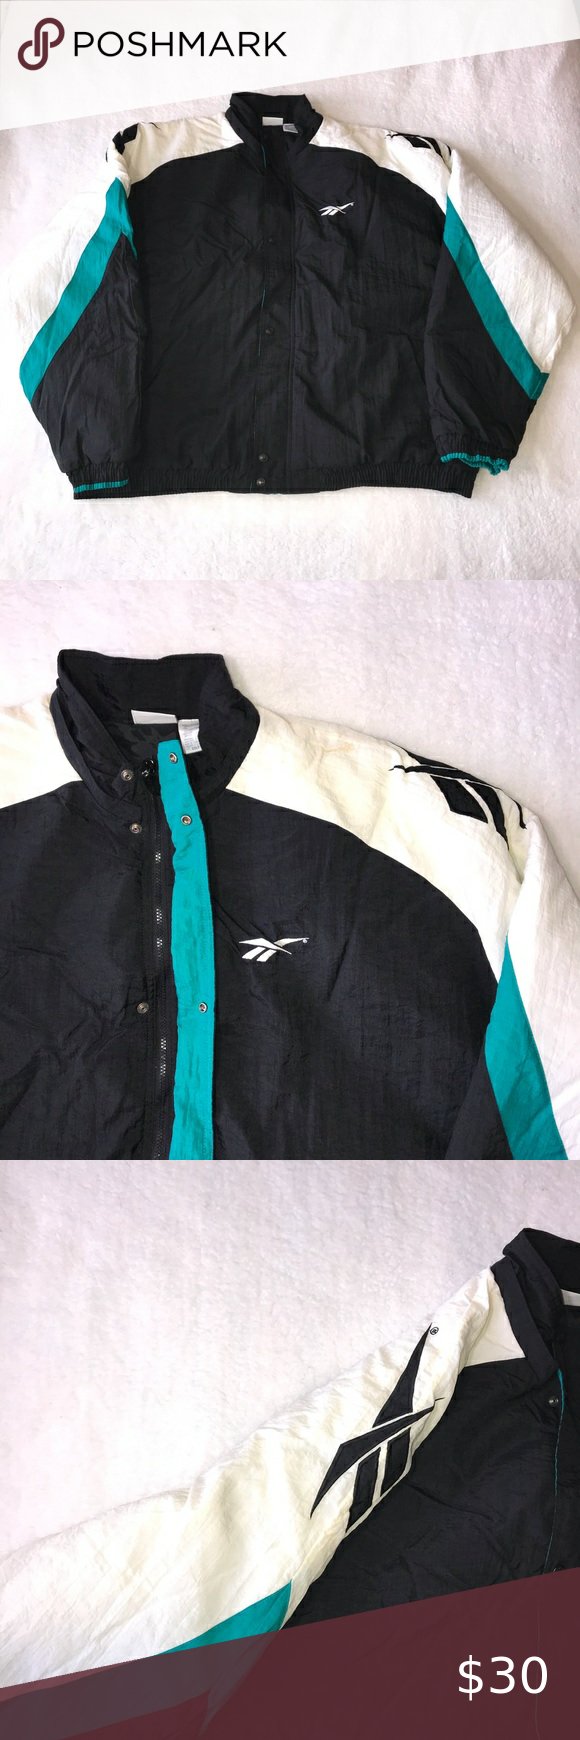 Vintage Reebok Puffer Jacket 2xlt Full Zip Taiwan Vintage Reebok Jackets White Puffer [ 1740 x 580 Pixel ]